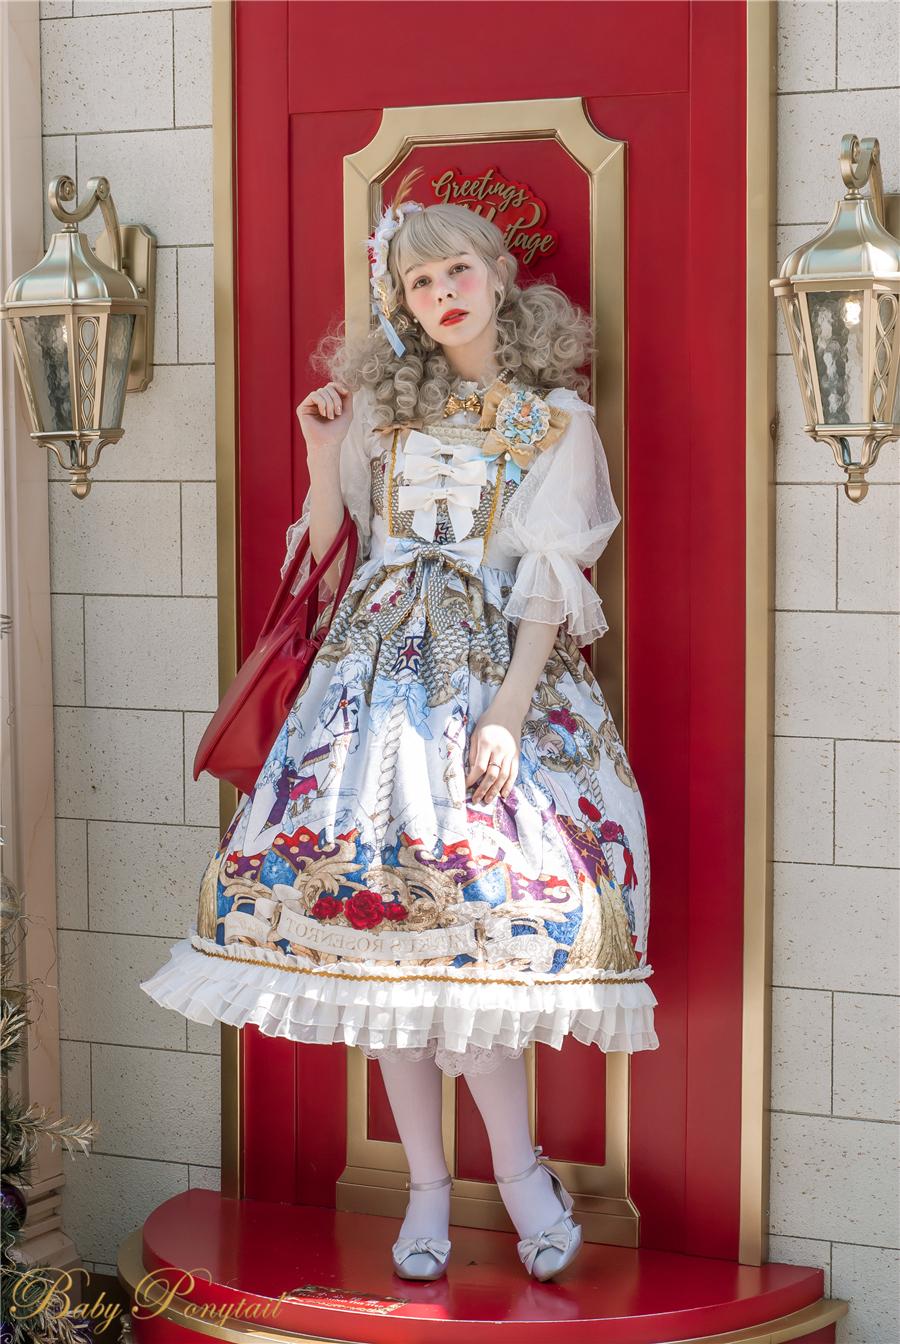 Baby Ponytail_Circus Princess_Silver JSK_Claudia18.jpg